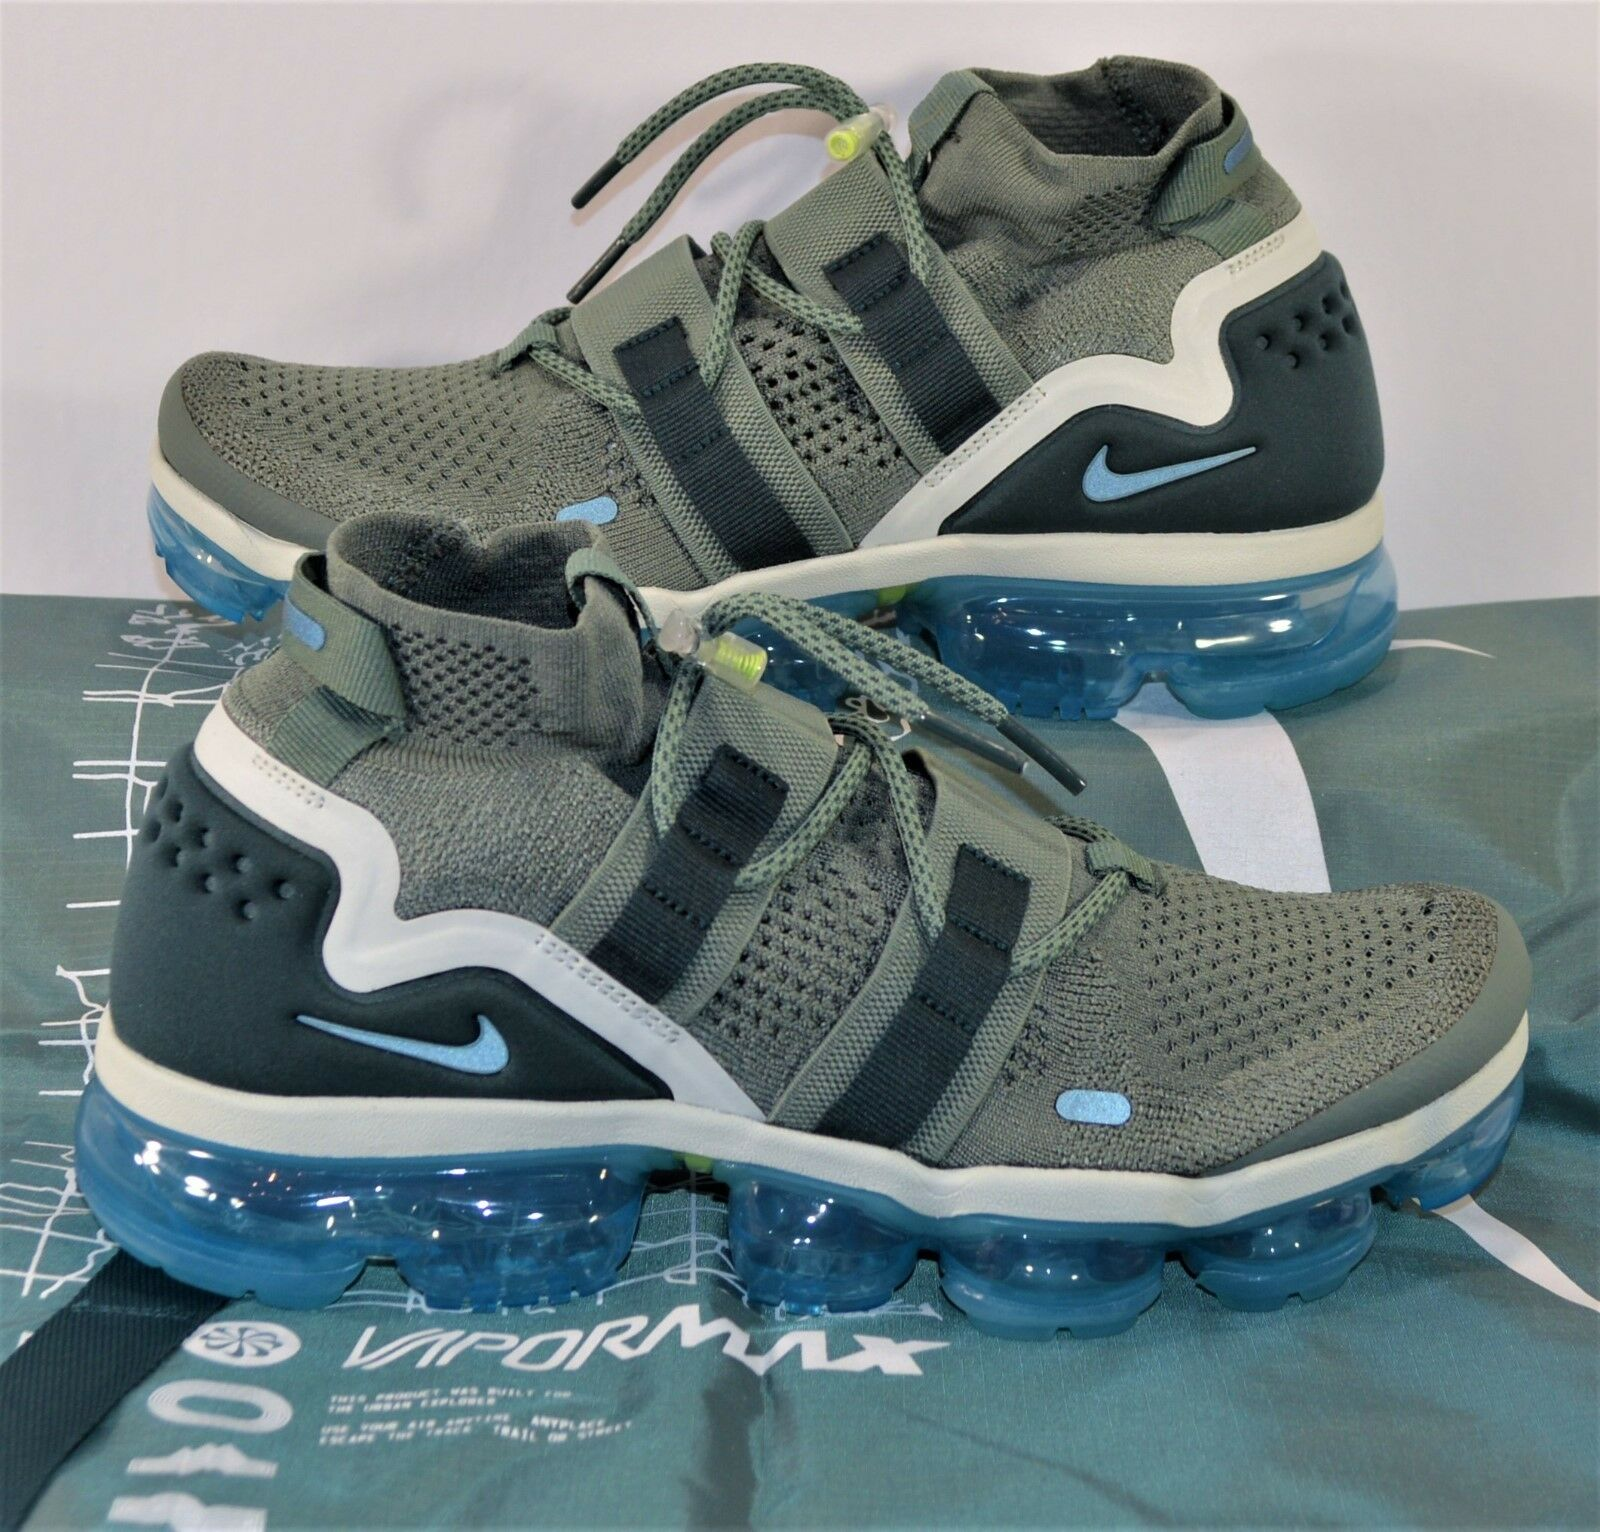 Nike Vapormax FK Utility Flyknit Grey & Blue Running Shoes Sz 9 NEW AH6834 300